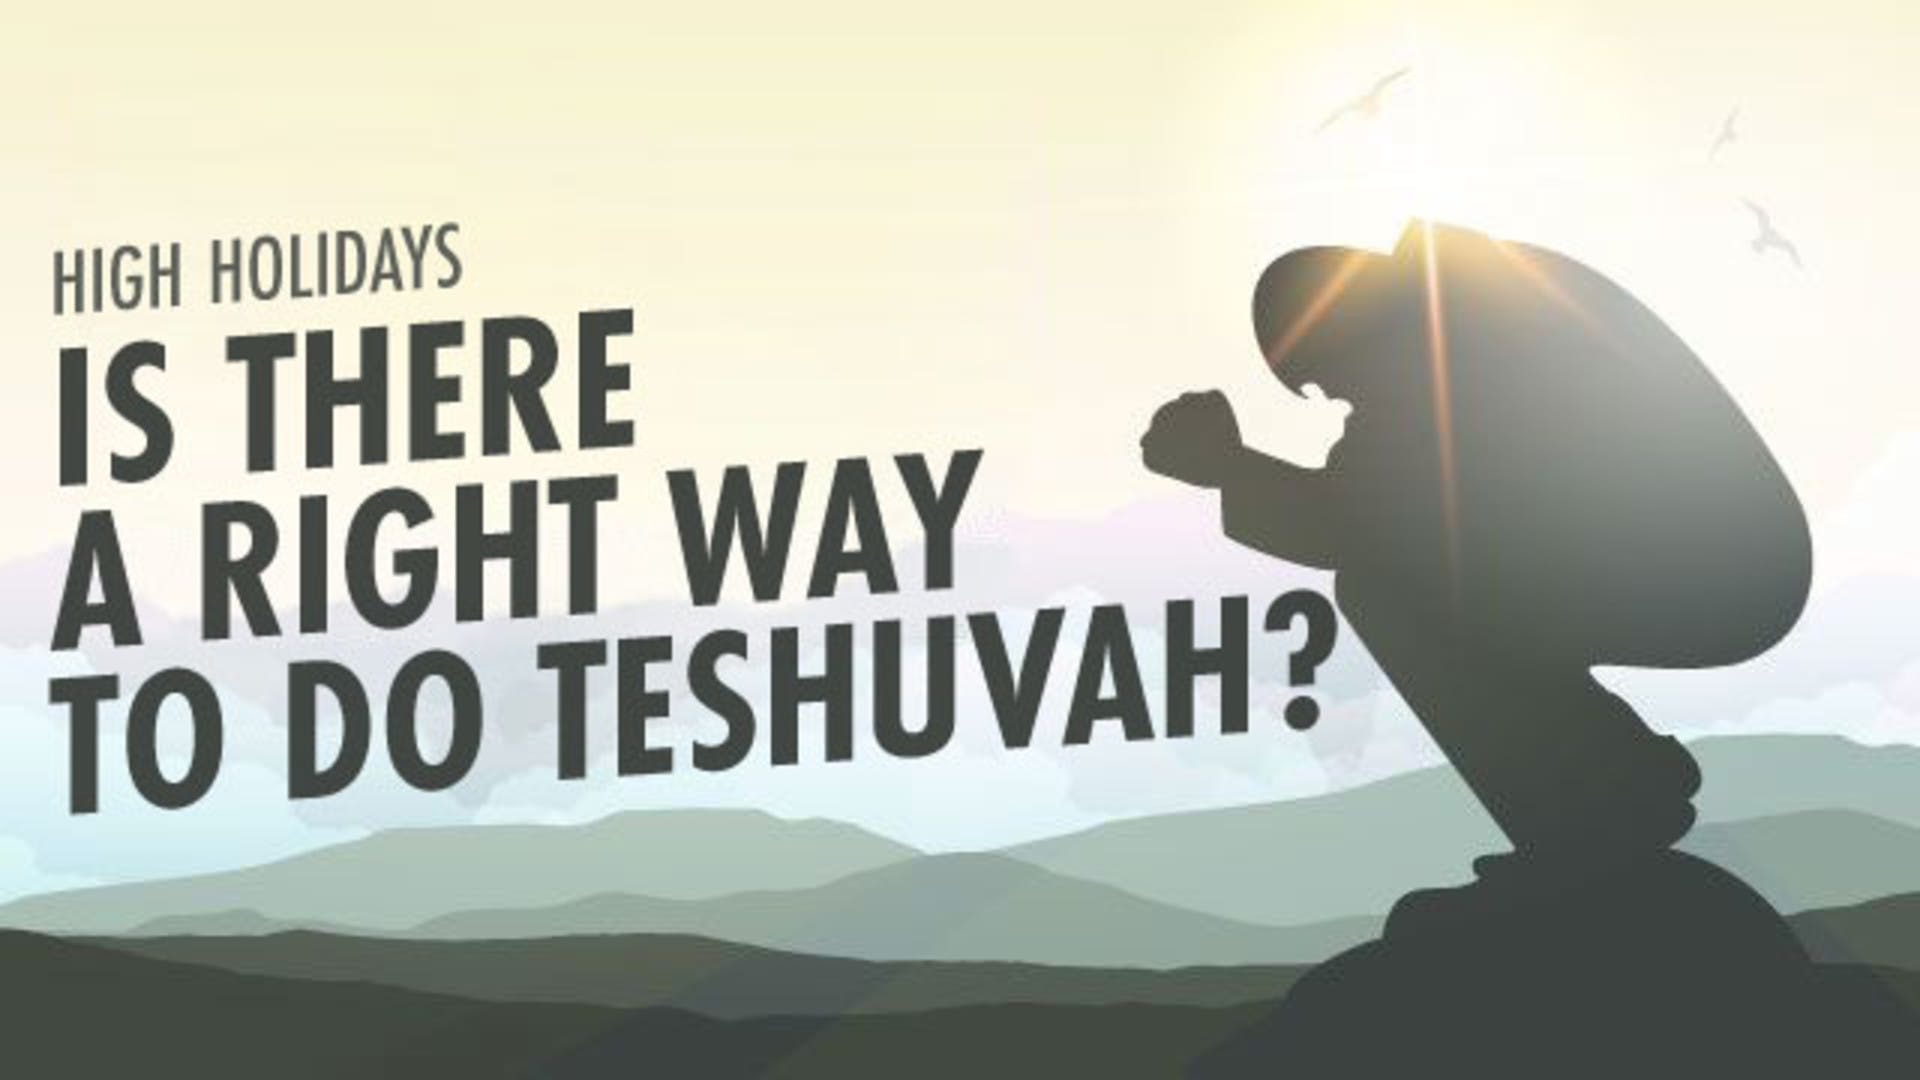 Teshuvah hilcot steps of repentance